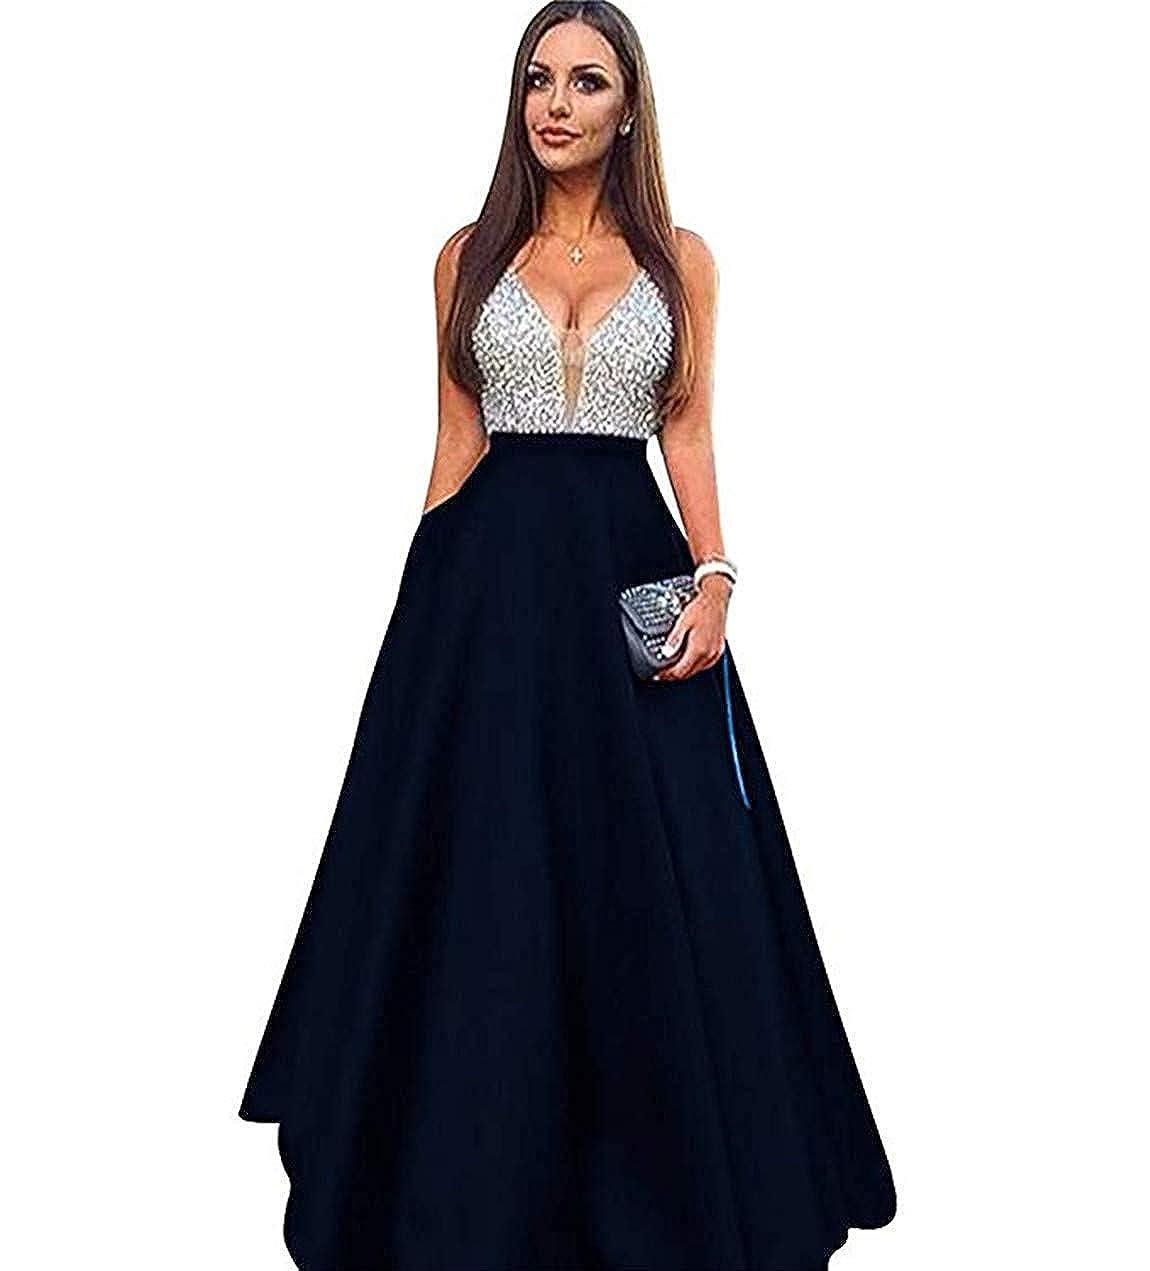 Navy Lnxianee Women's Beaded VNeck Prom Dresses Long Formal Evening Gowns